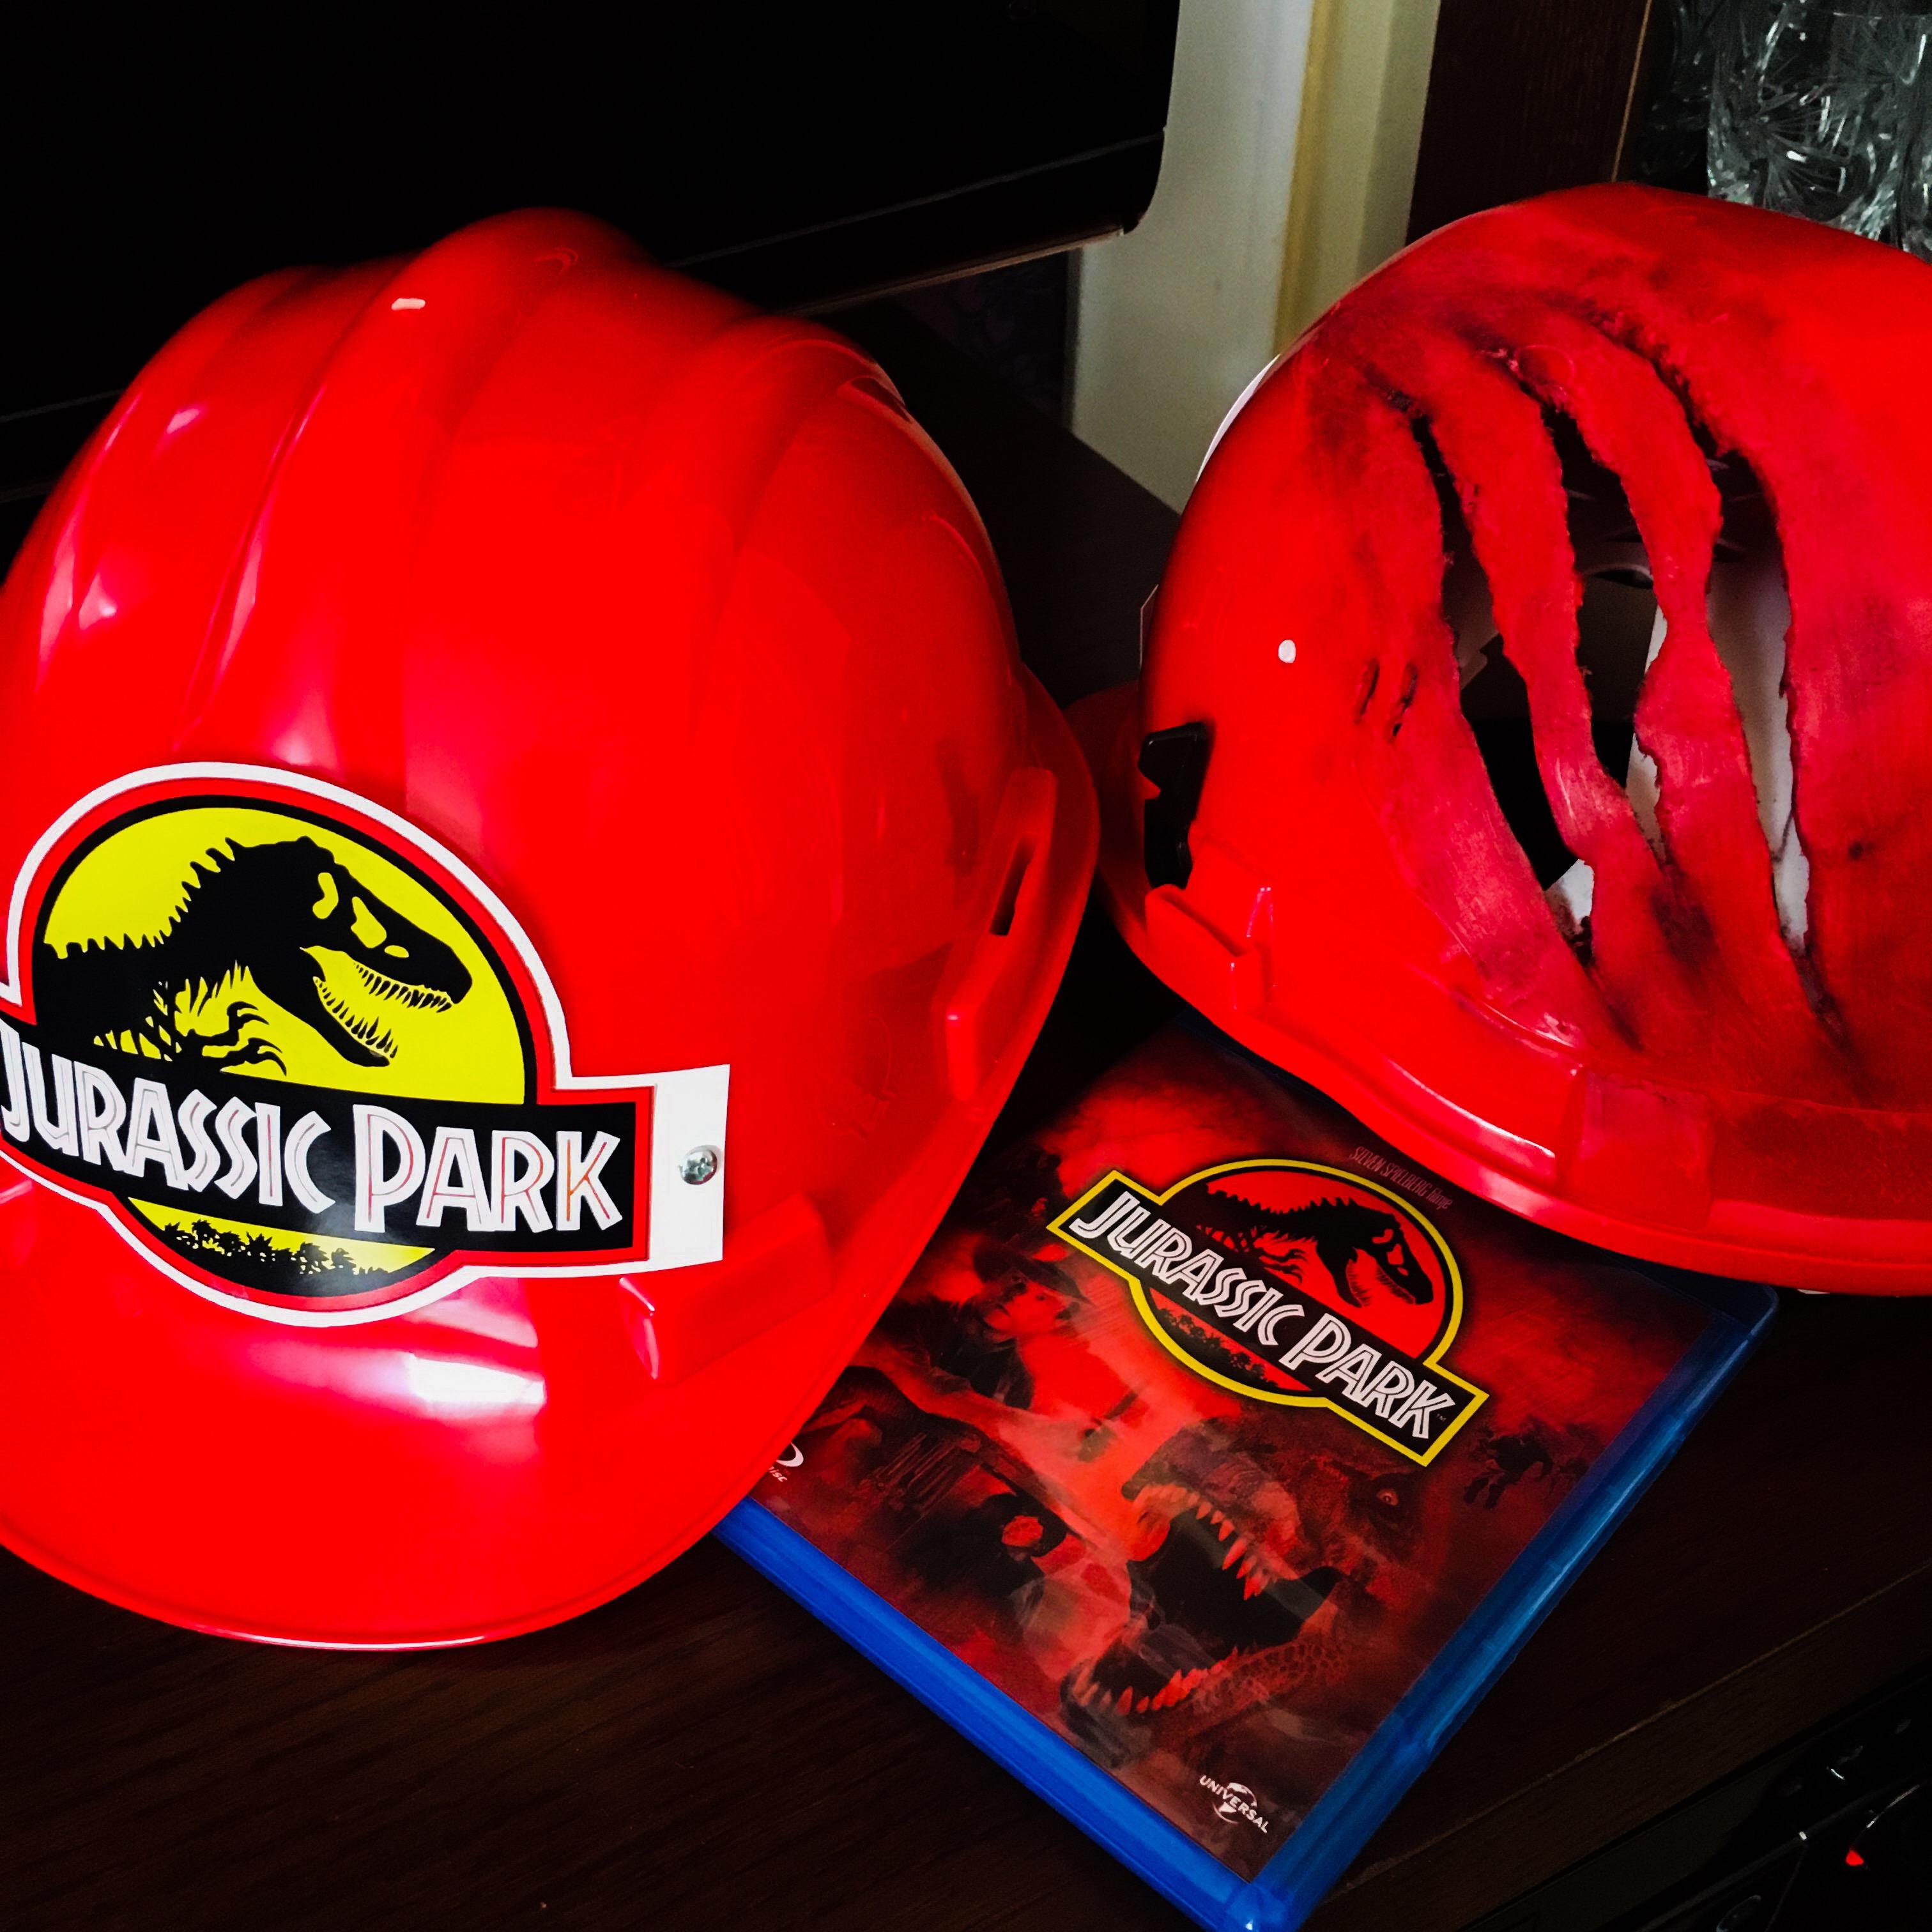 szmk_diy_jurassic_park_helmet_jurassic_world_sisak_2.JPEG